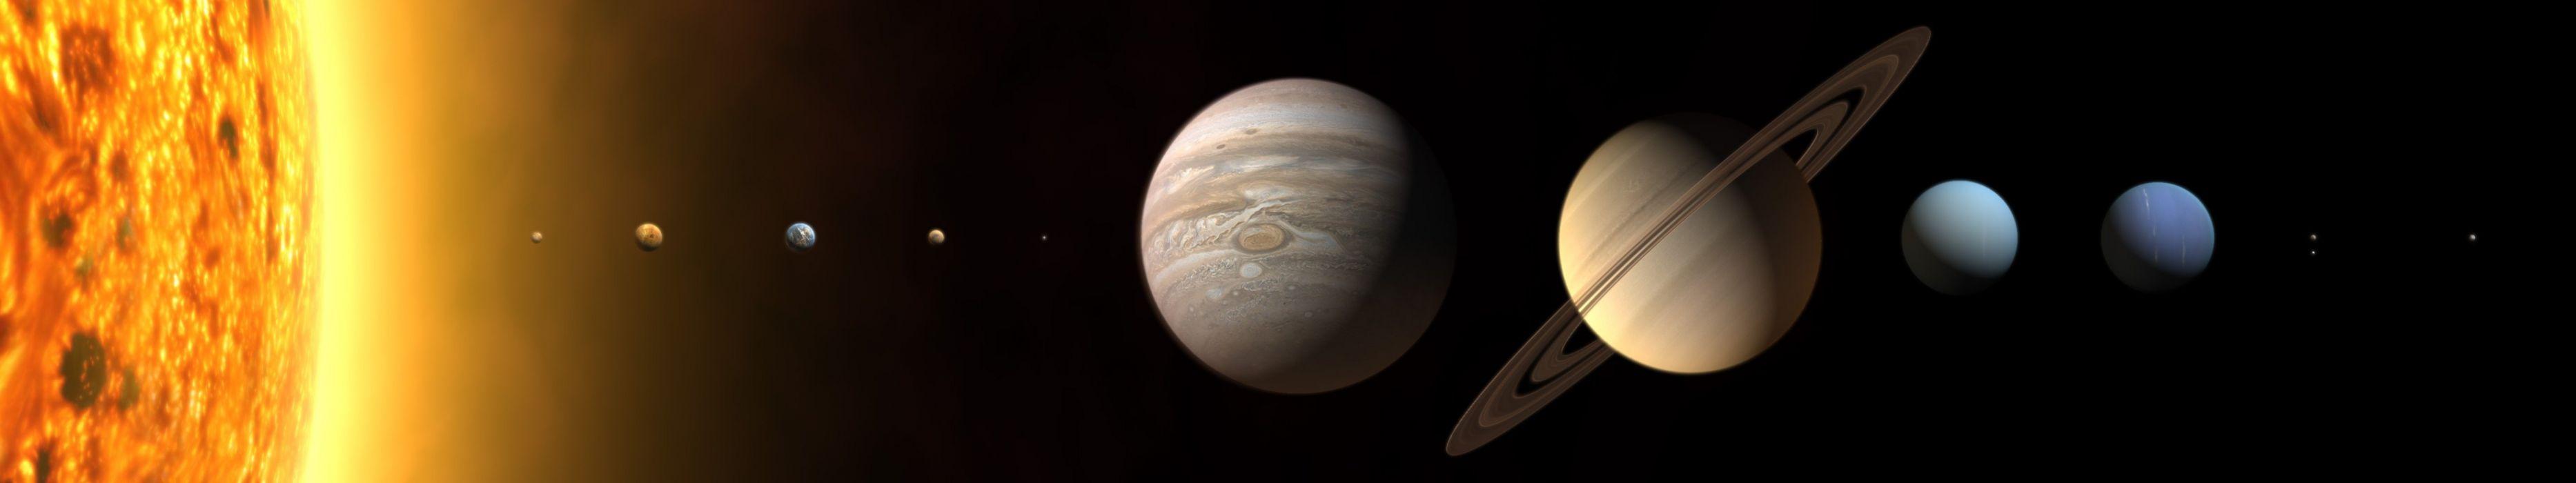 Sun Solar System planets Mars Earth Jupiter Saturn Pluto Neptune Mercury Venus Uranus multiscreen wallpaper